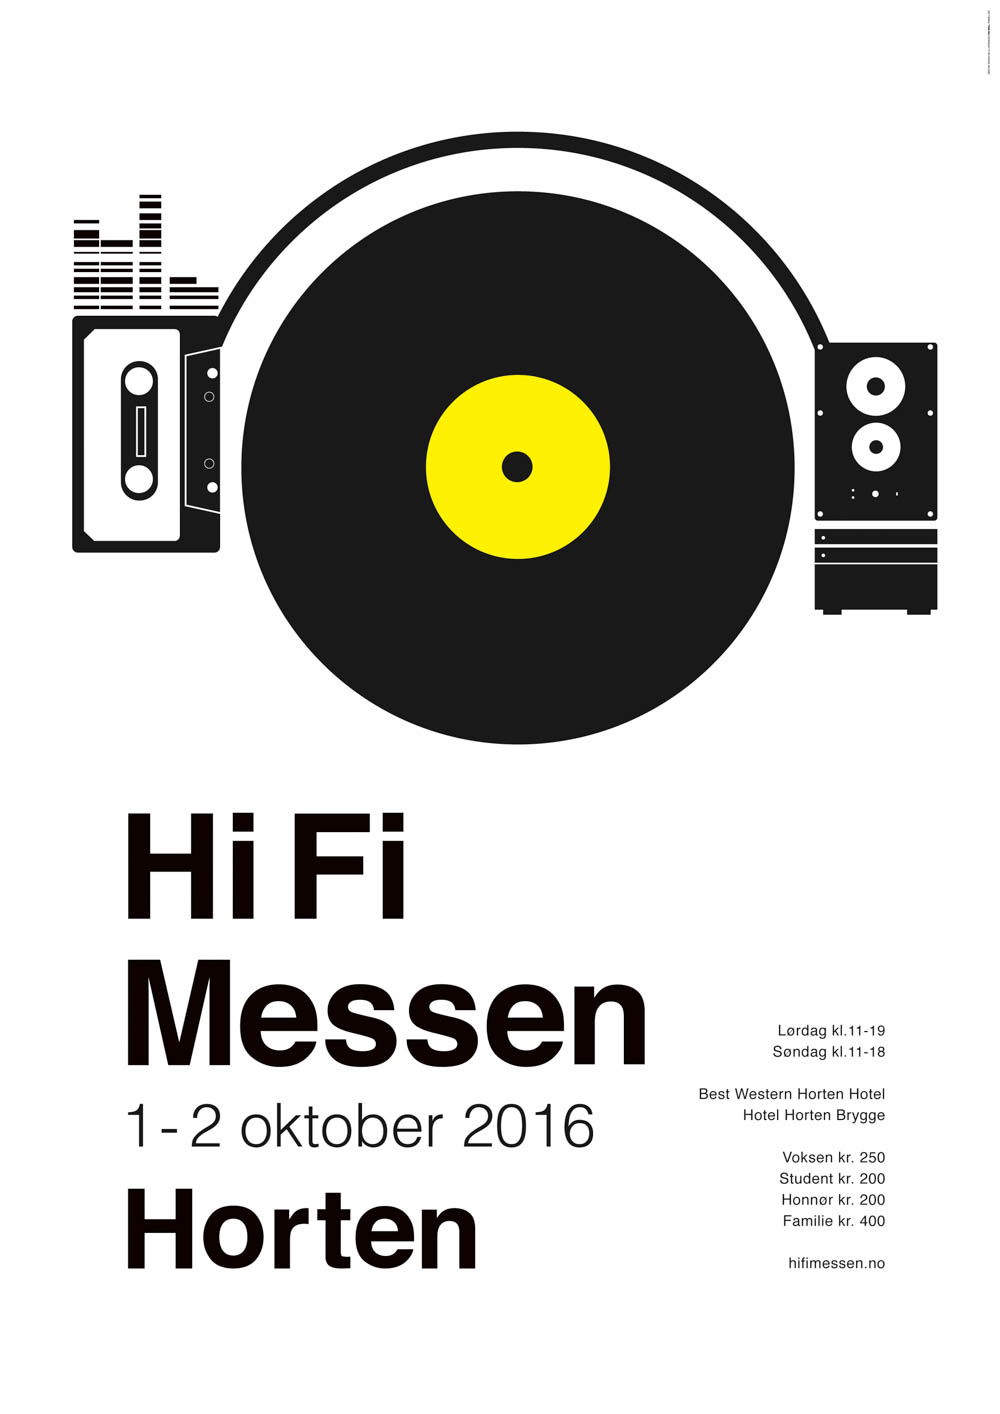 Besøk Hi Fi Messen i Horten 2016- 1-2 Oktober